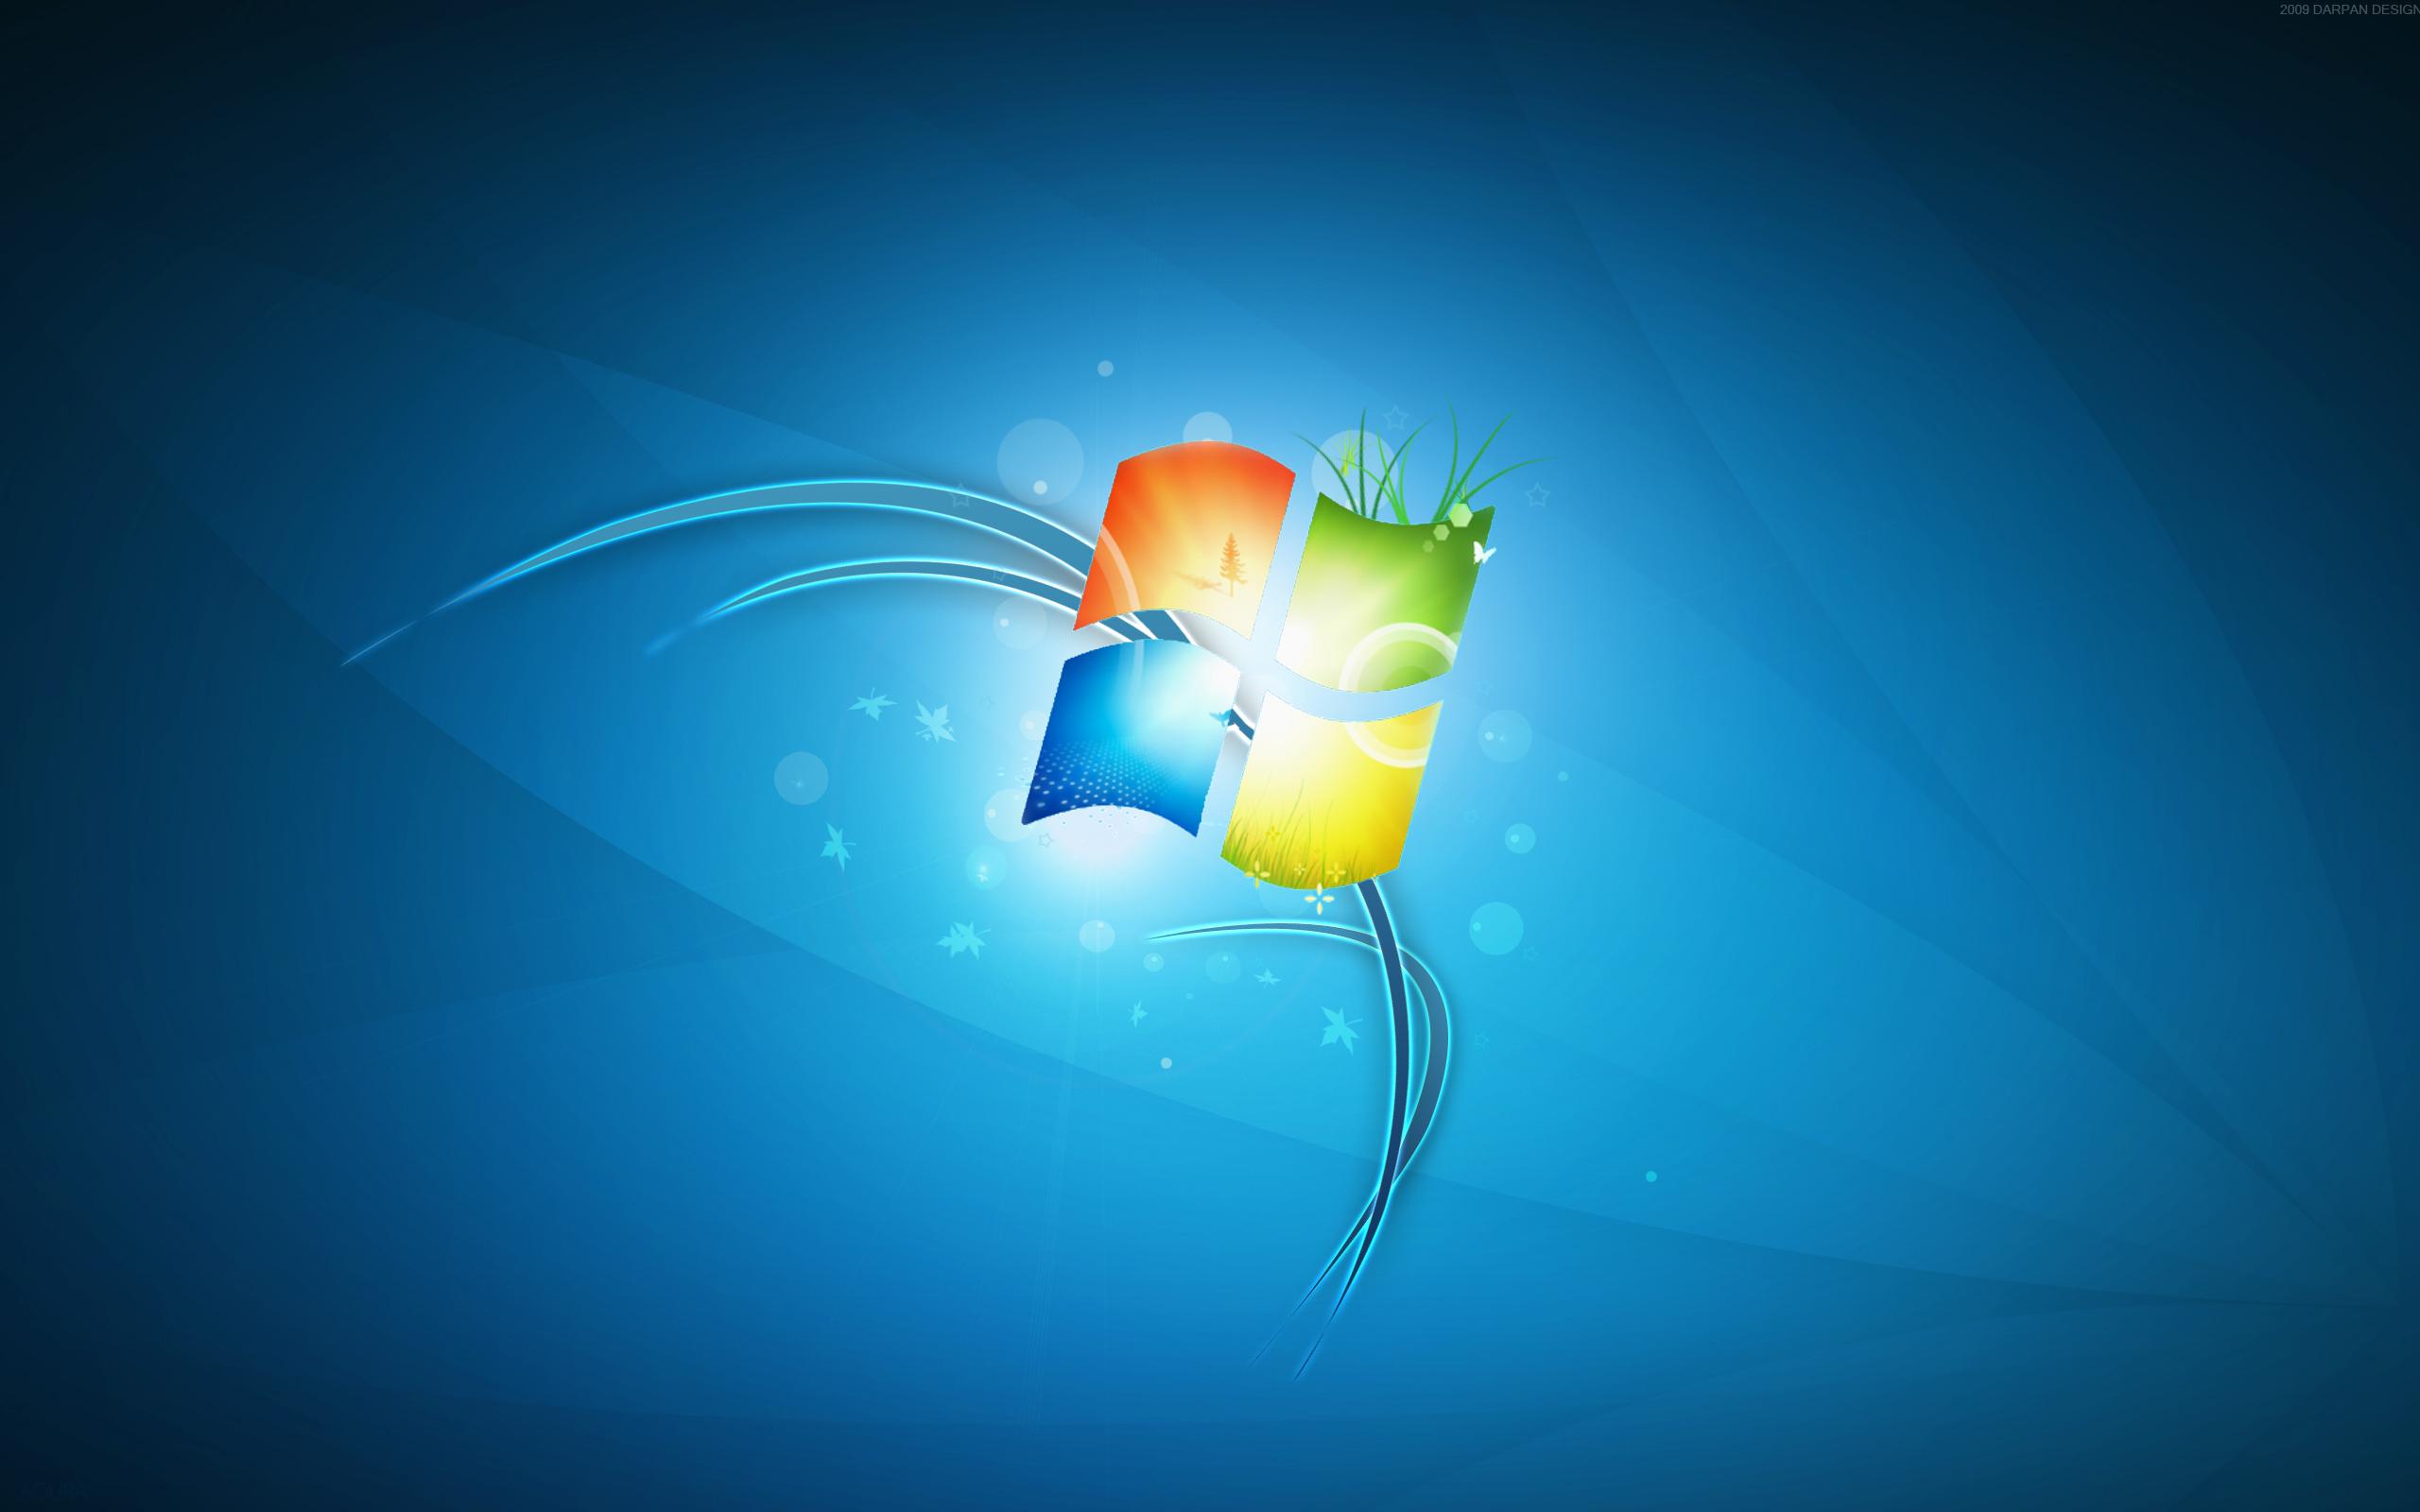 Wallpaper download microsoft - Microsoft Desktop Backgrounds Wallpapers9